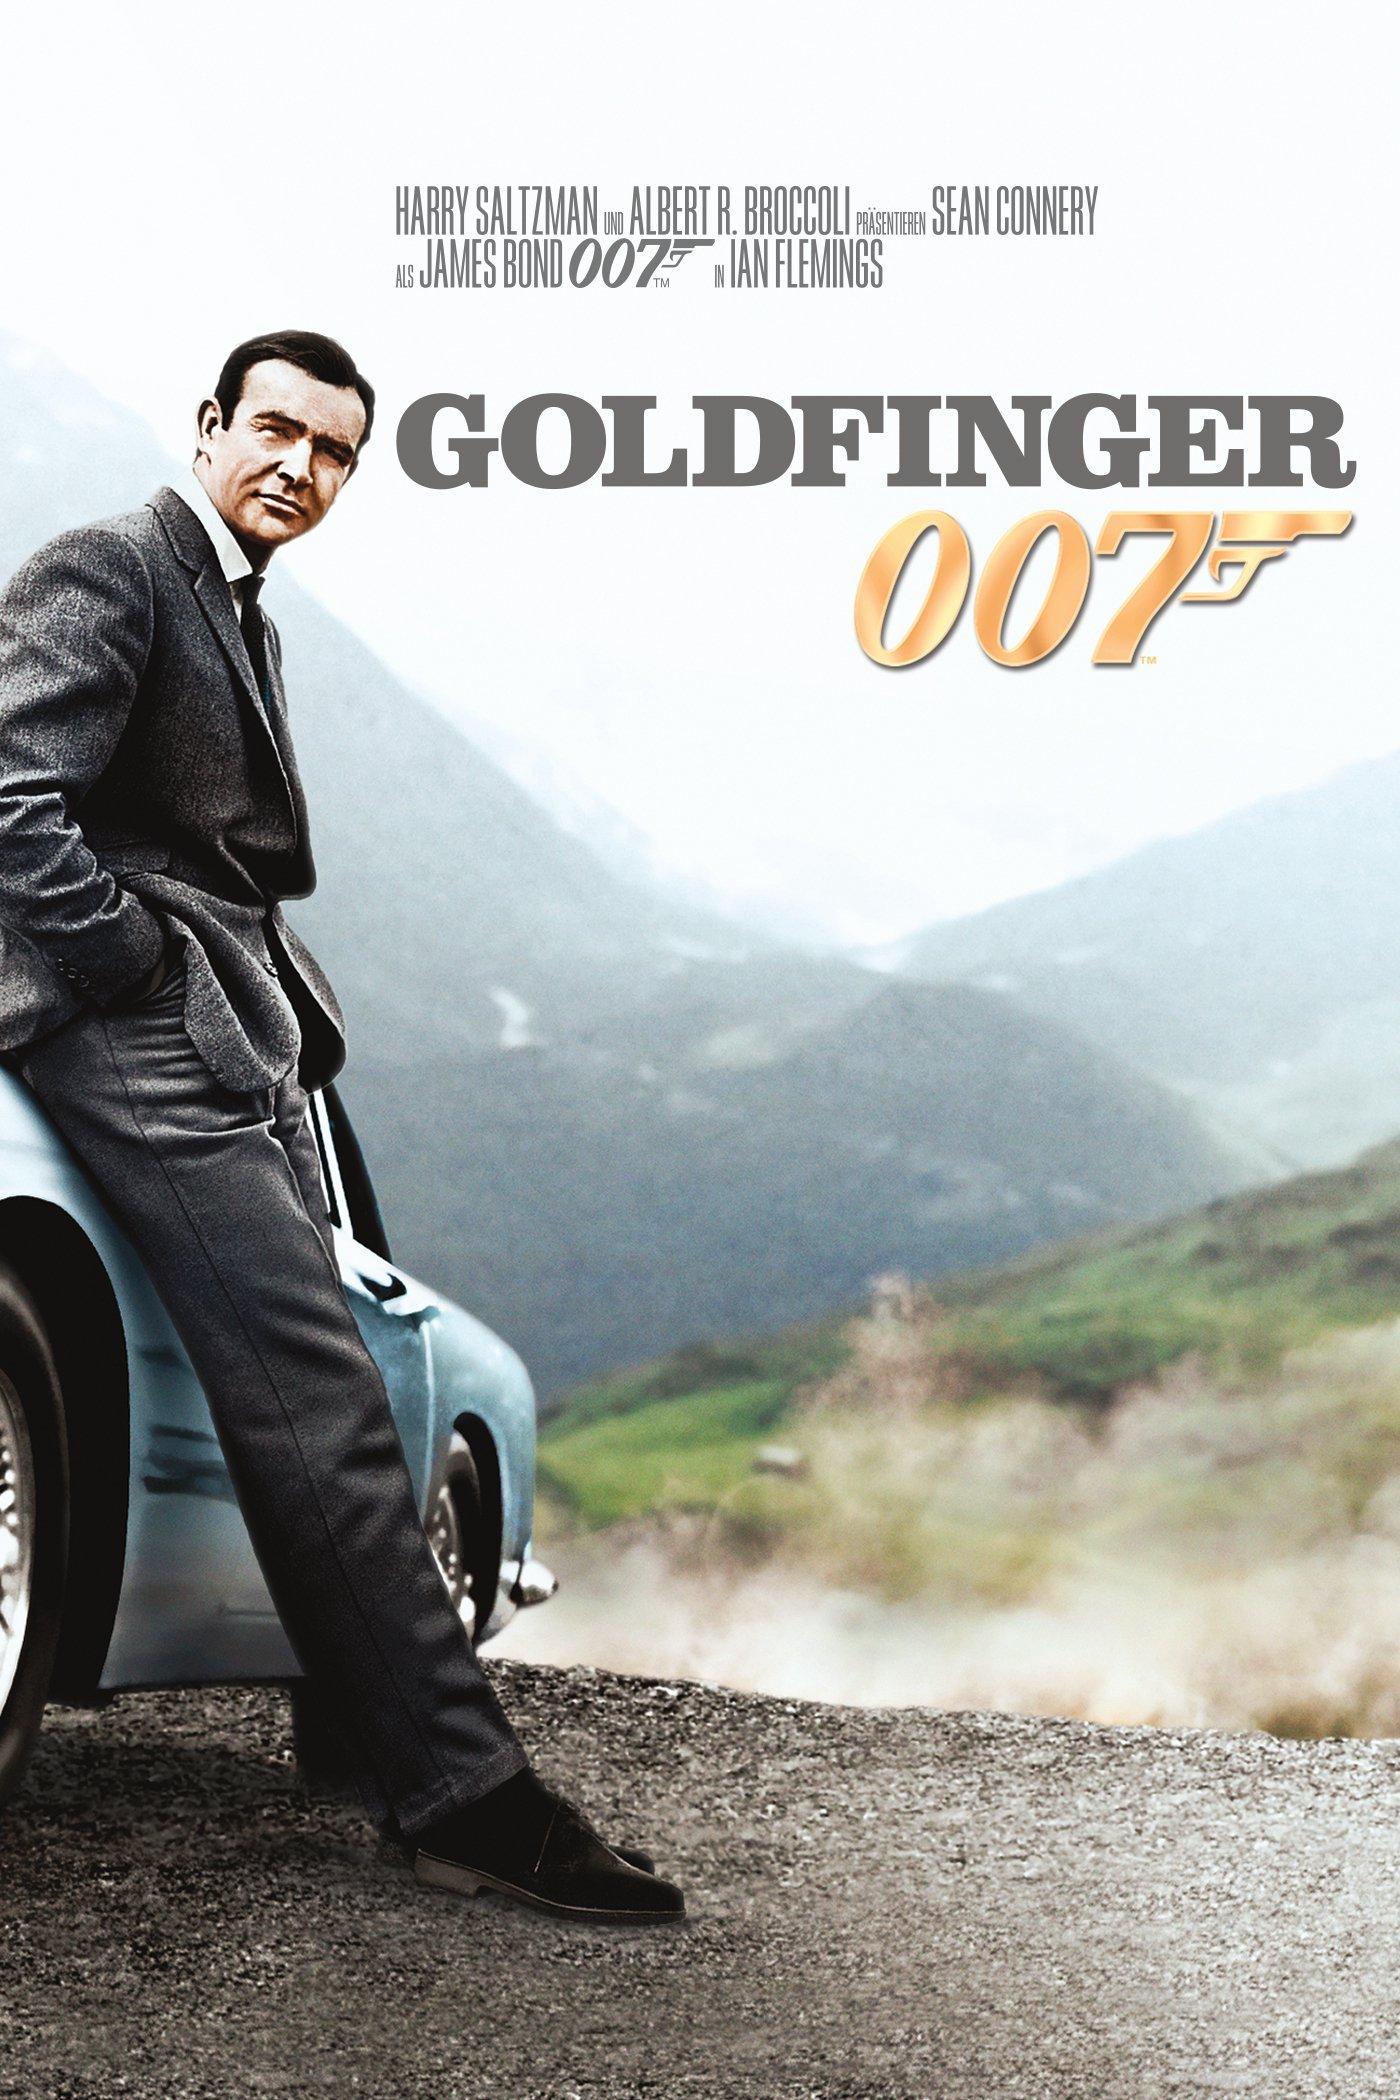 """James Bond 007 - Goldfinger"""